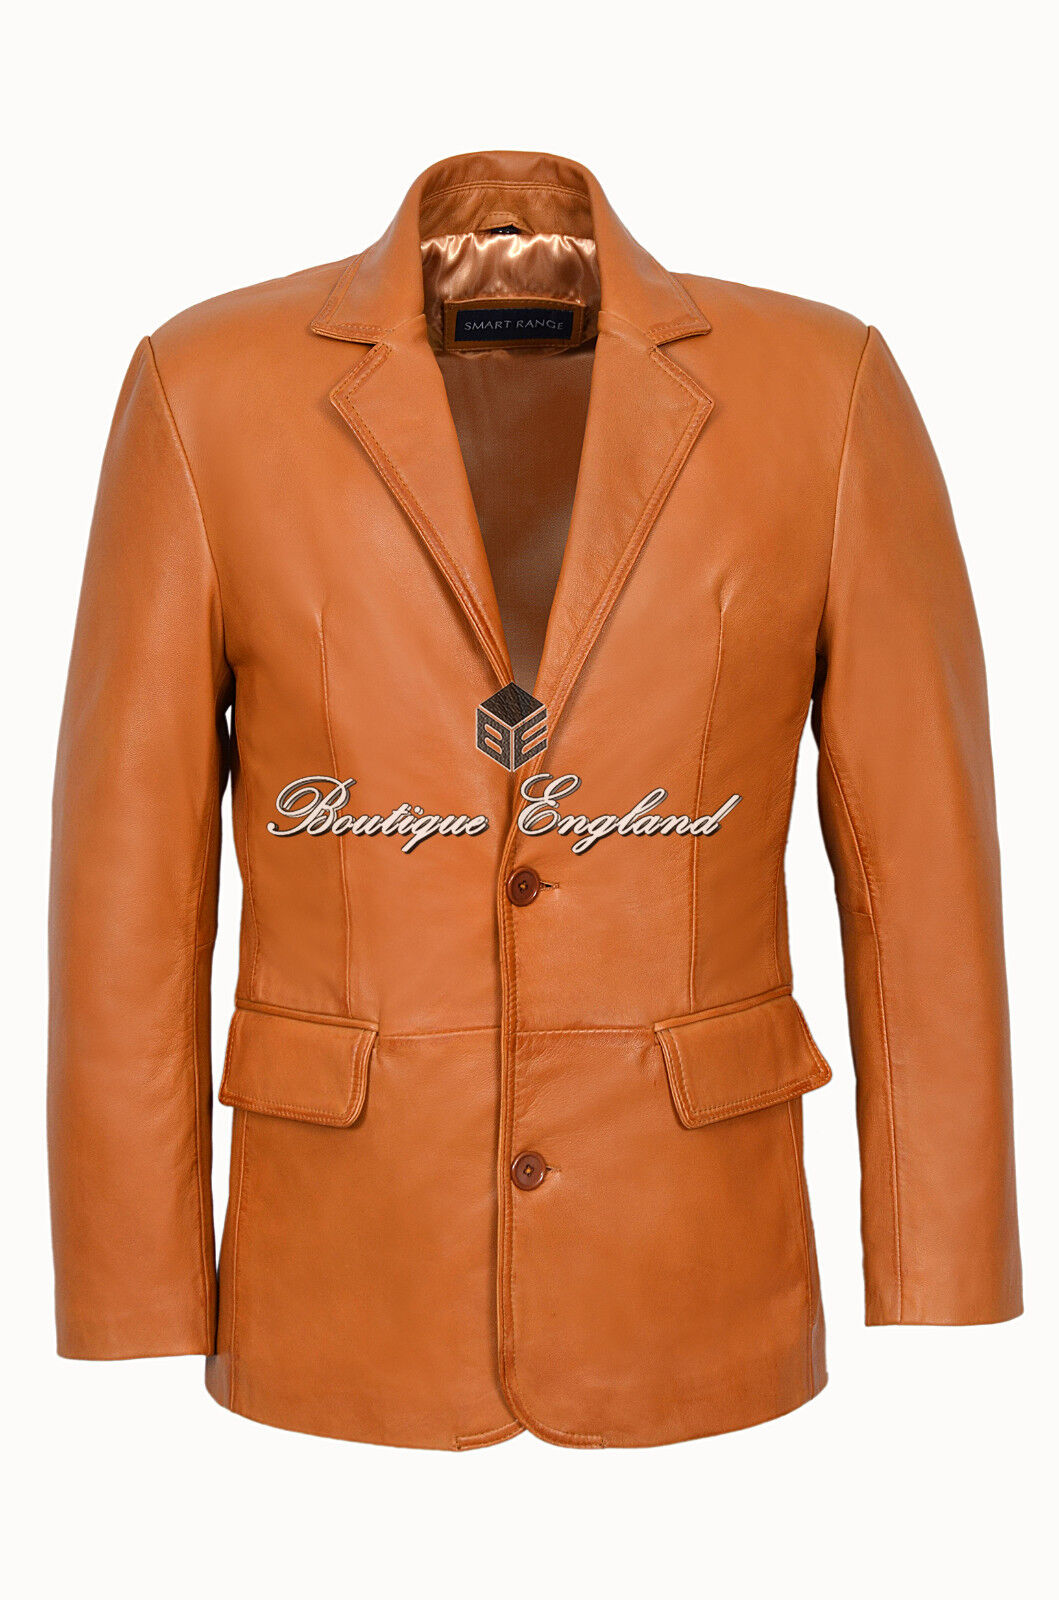 Herren Classic Leder Blazer TAN Formal Classic TailoROT SOFT GENUINE LEATHER 2BB